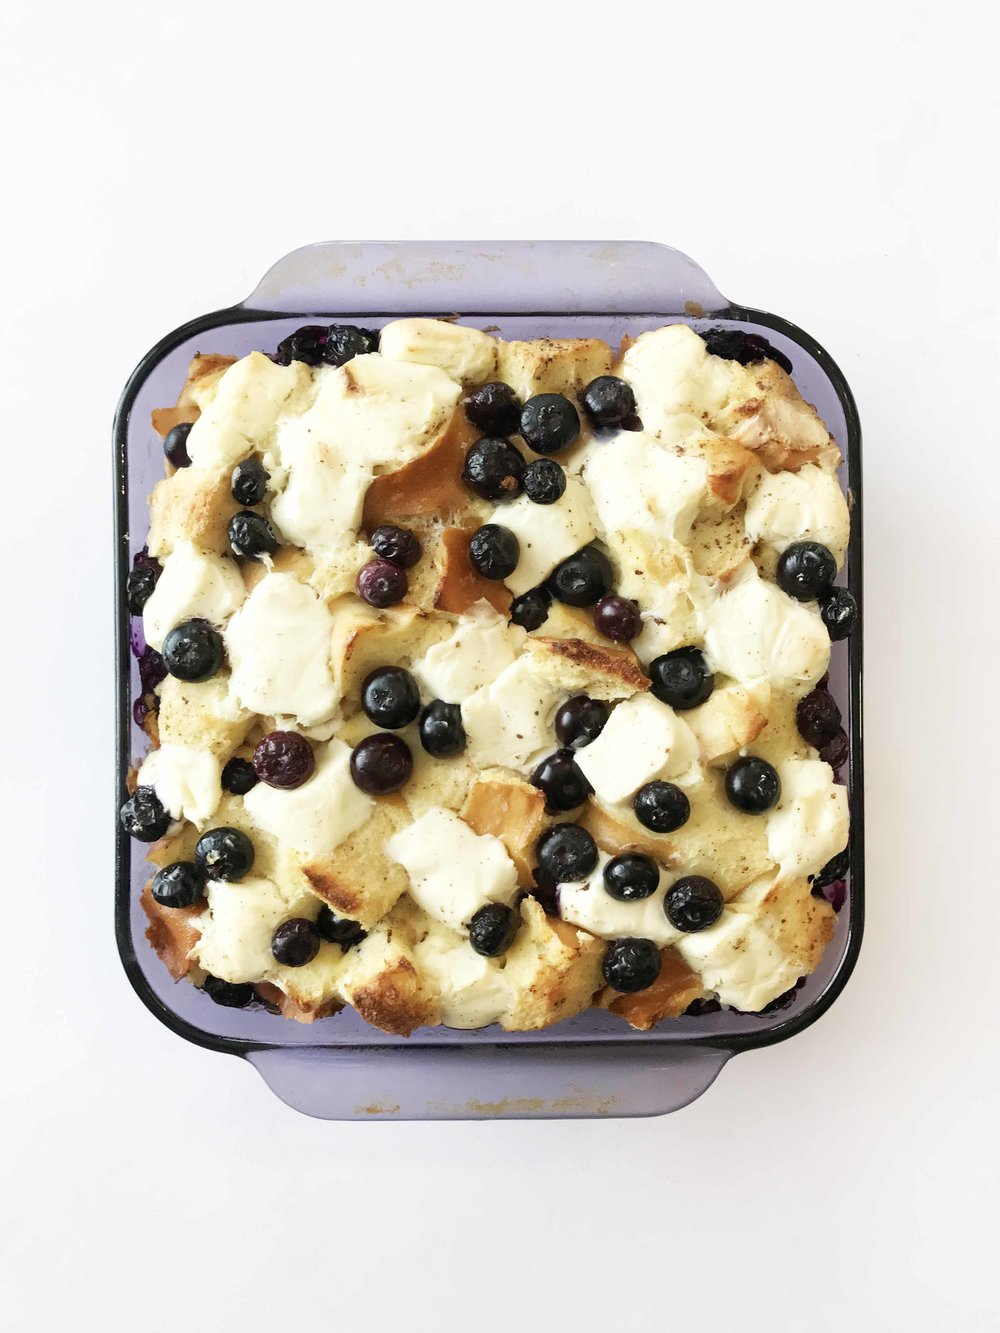 blueberry-french-toast-bake5.jpg